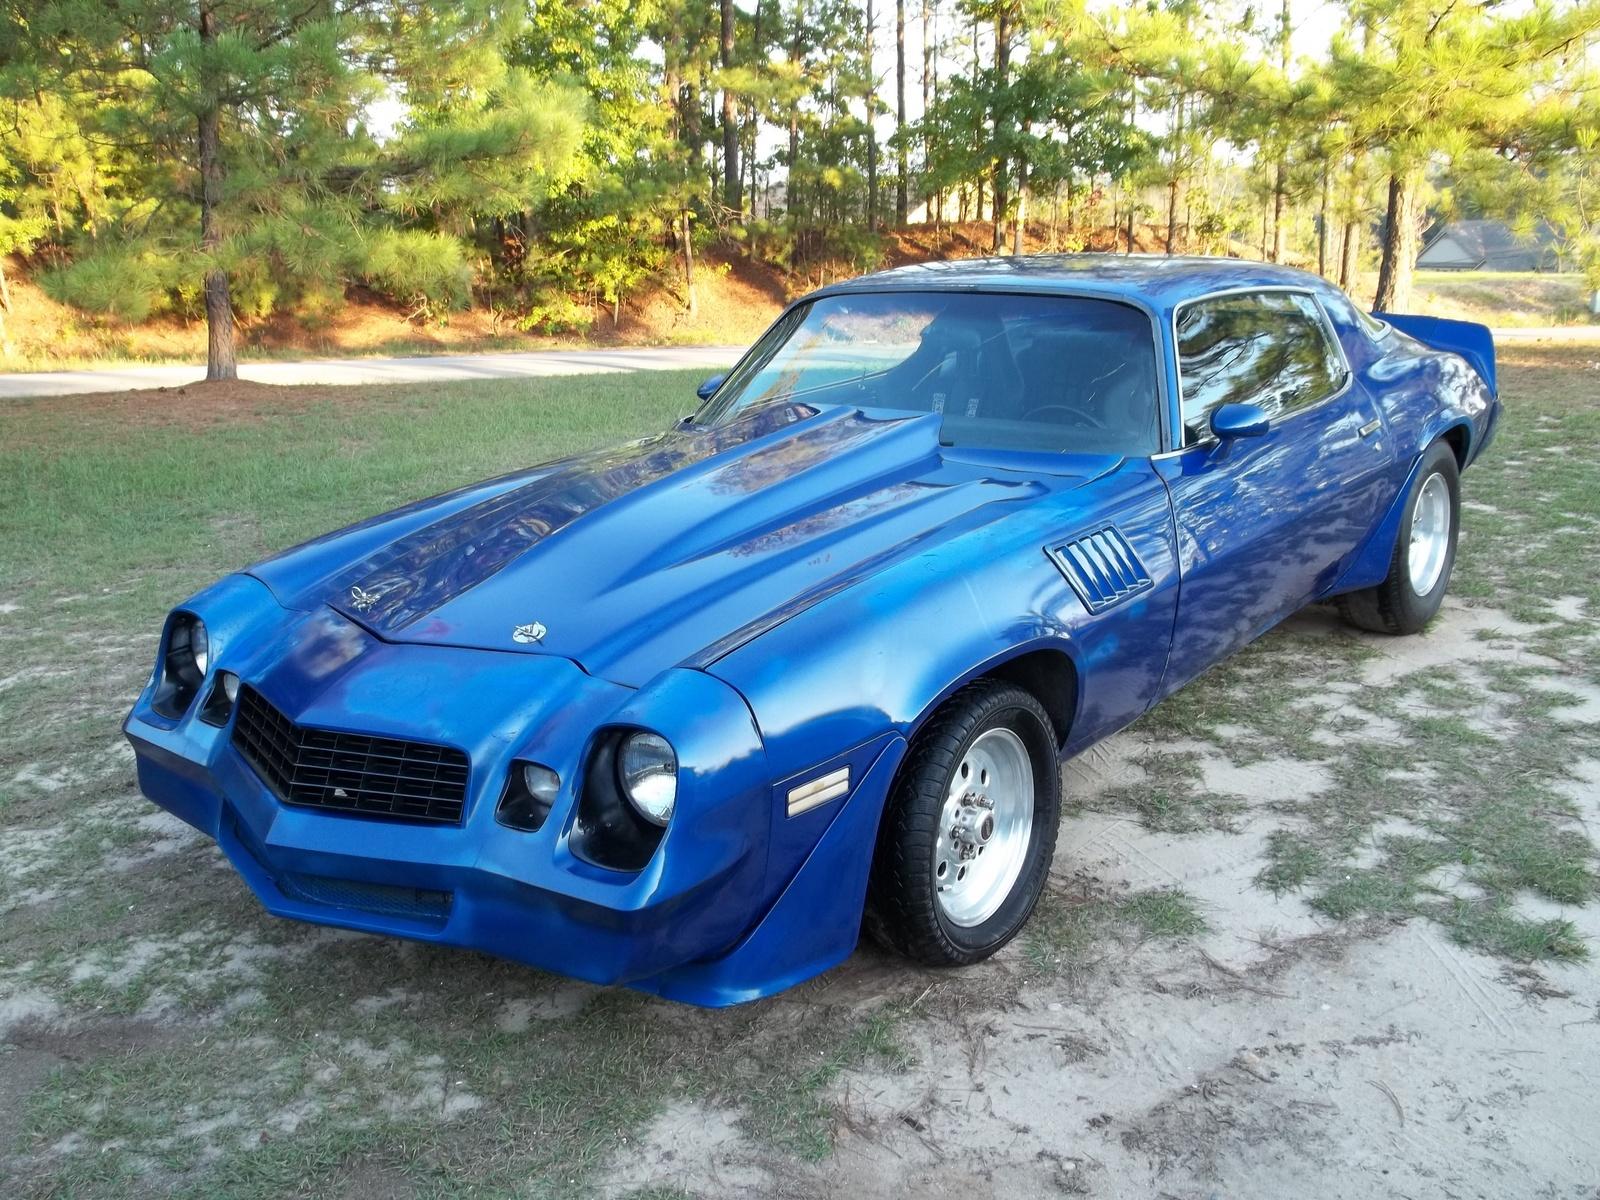 Used 1969 Chevrolet Camaro For Sale On Craigslist 2 Autos Post